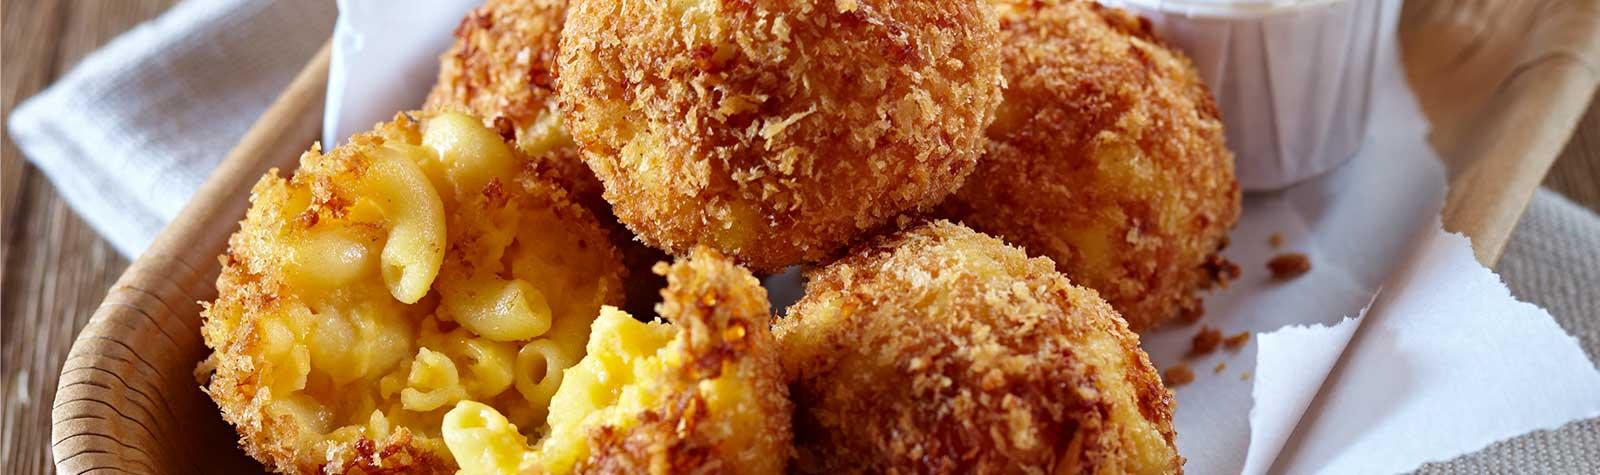 Mac & Cheese Balls